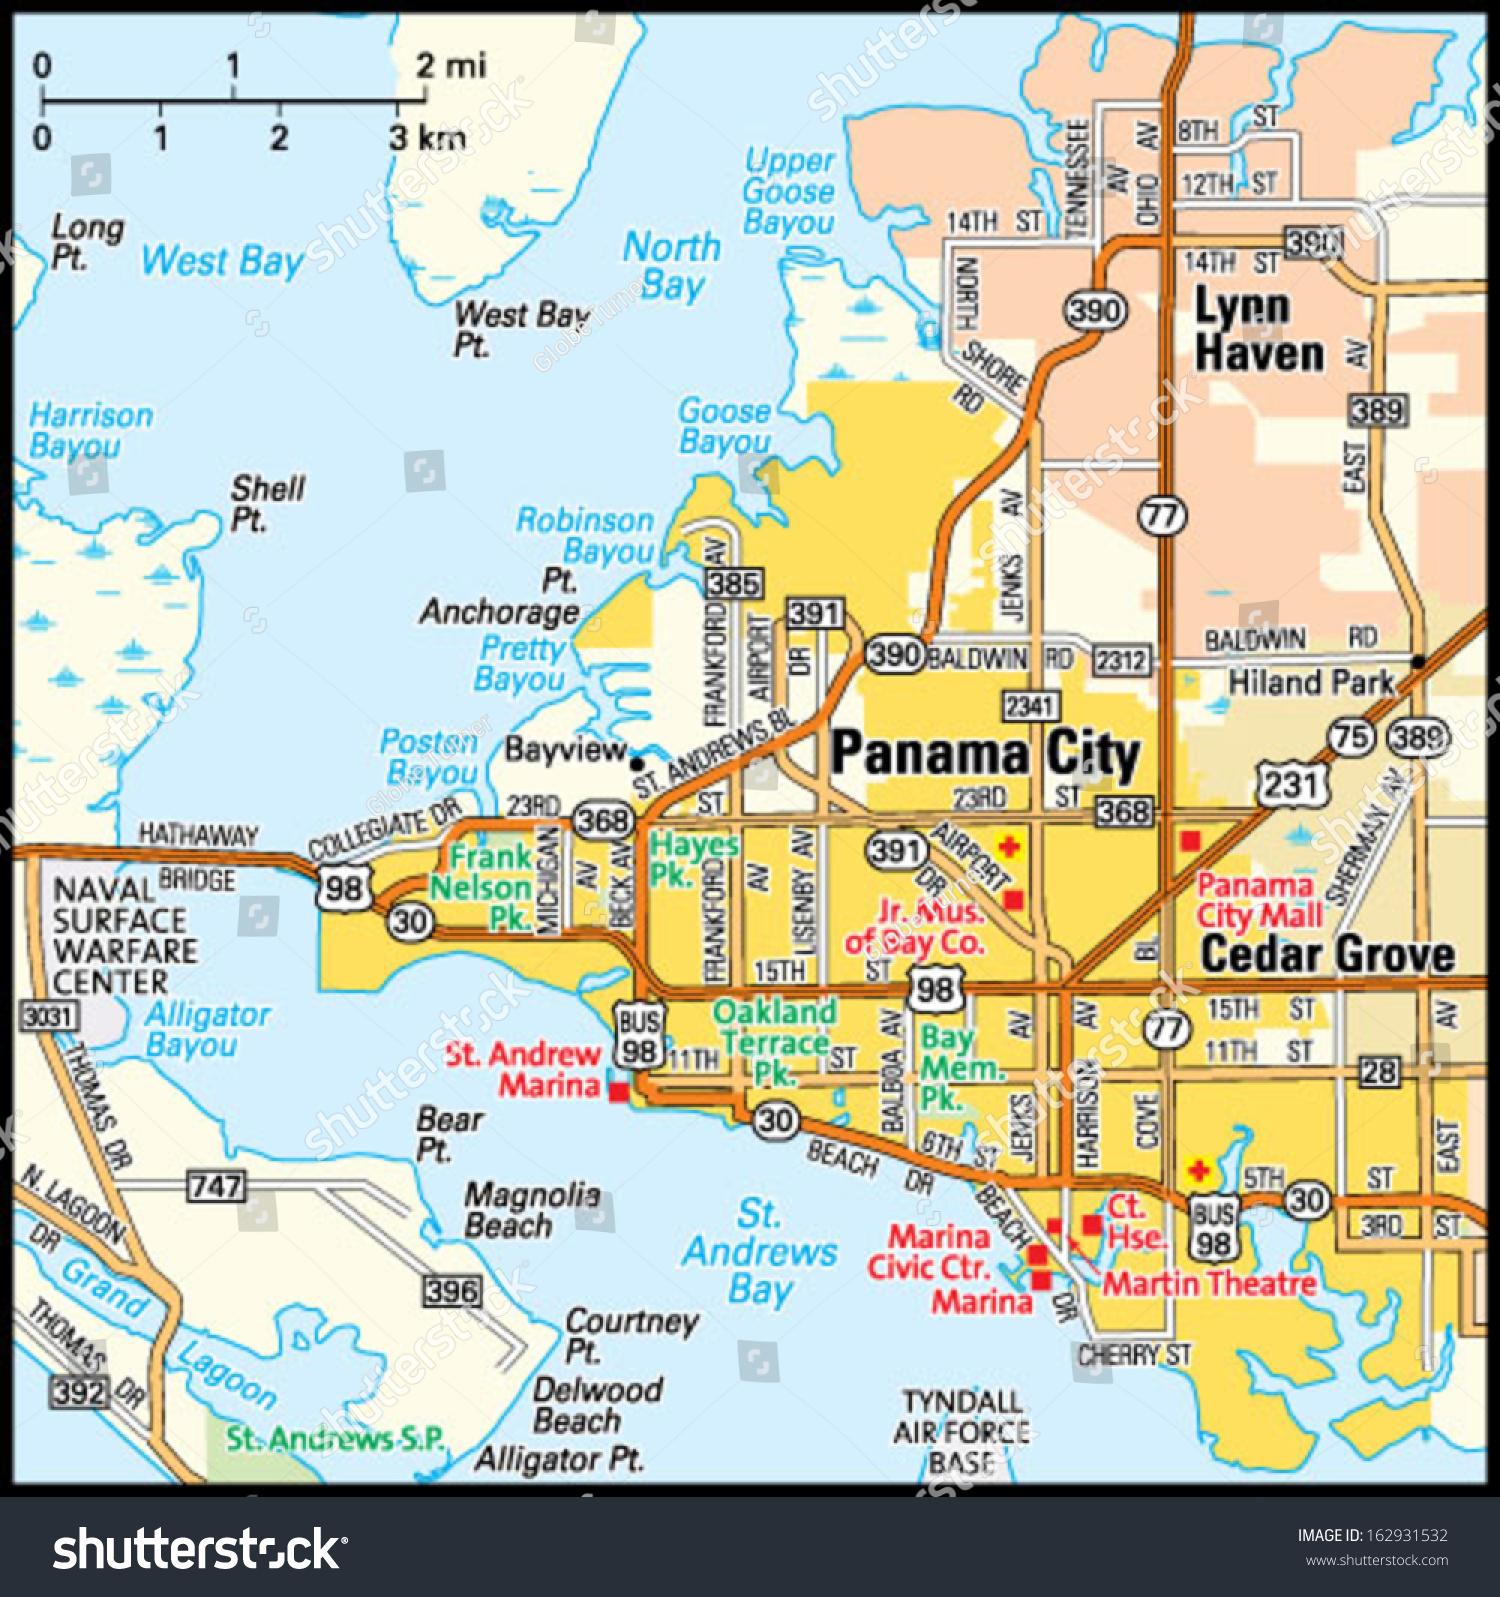 Map Of Panama City Google Planet Map - Street Map Panama City Florida